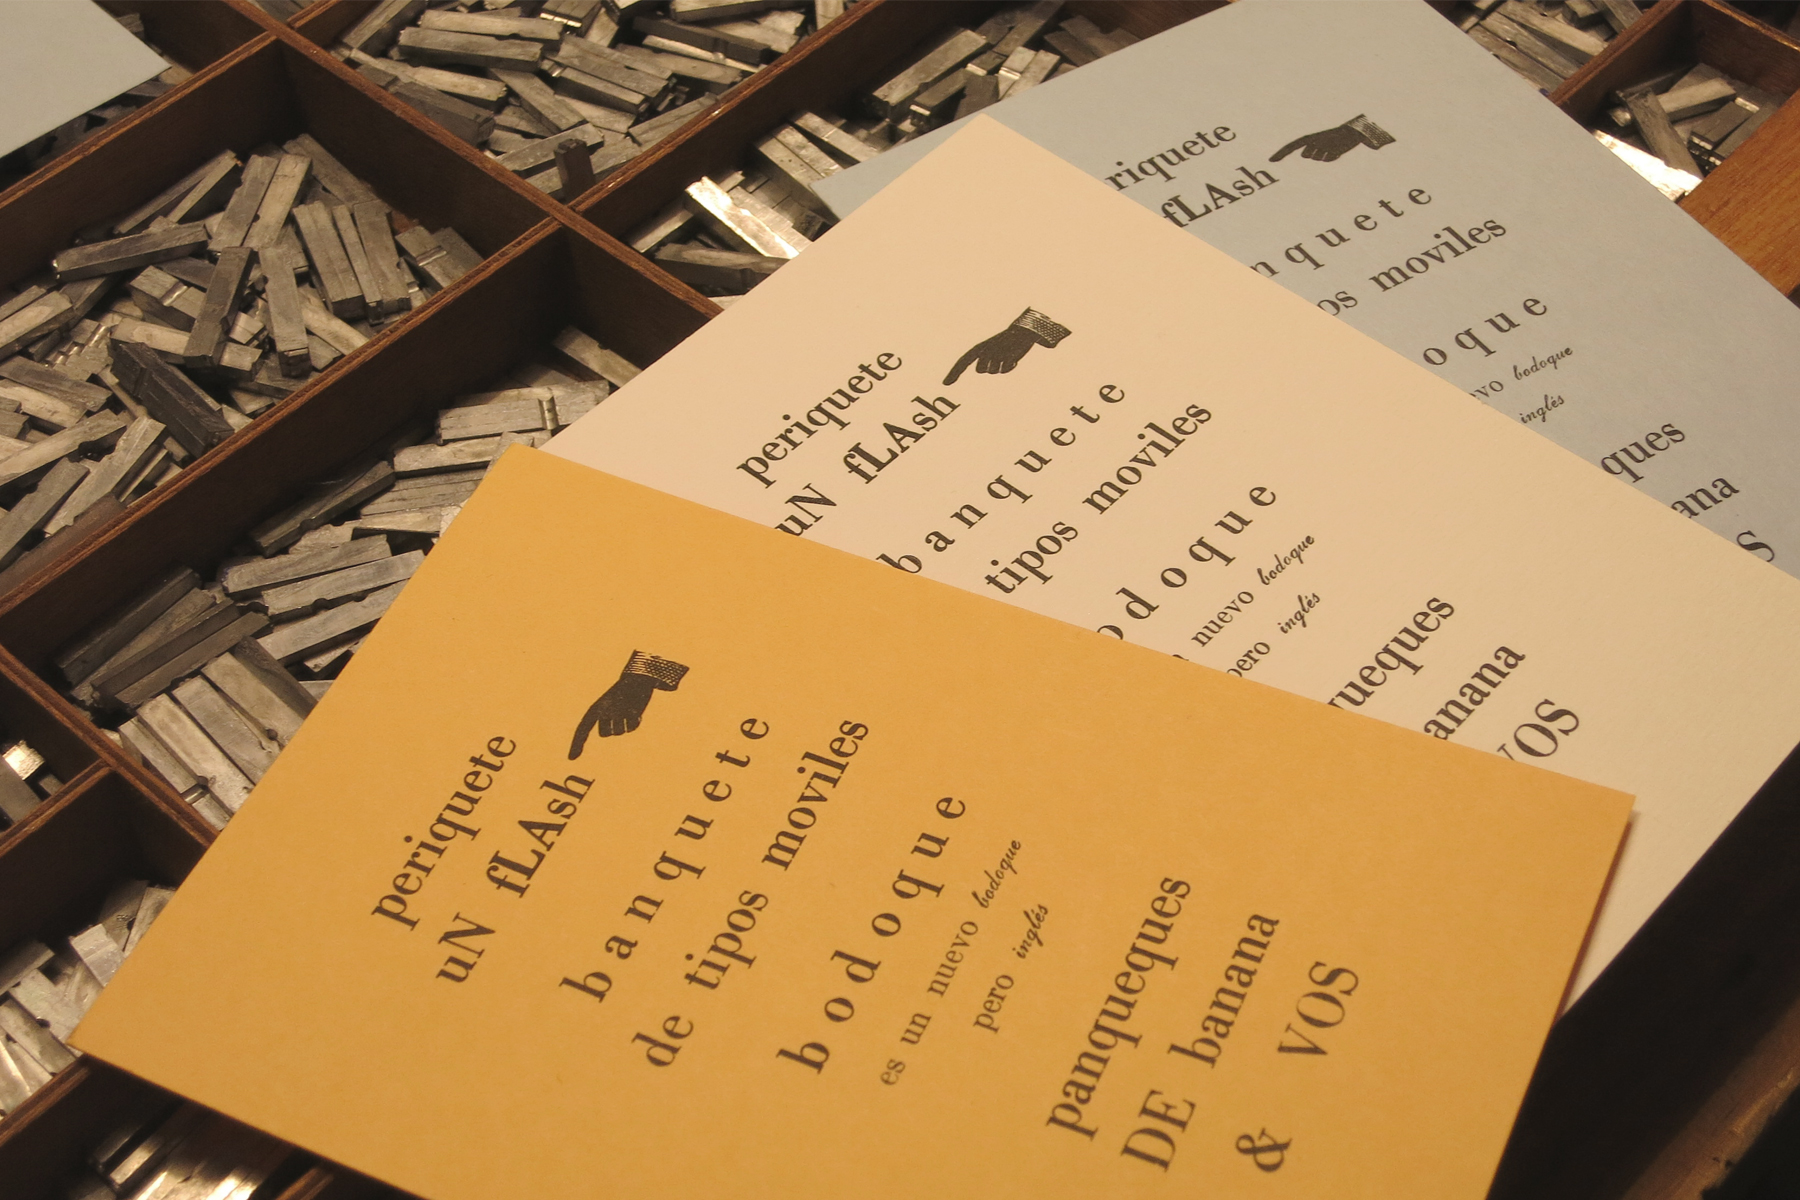 4-taller-letra-por-letra-papel-principal-letterpress-imprenta-tipografica-1.jpg